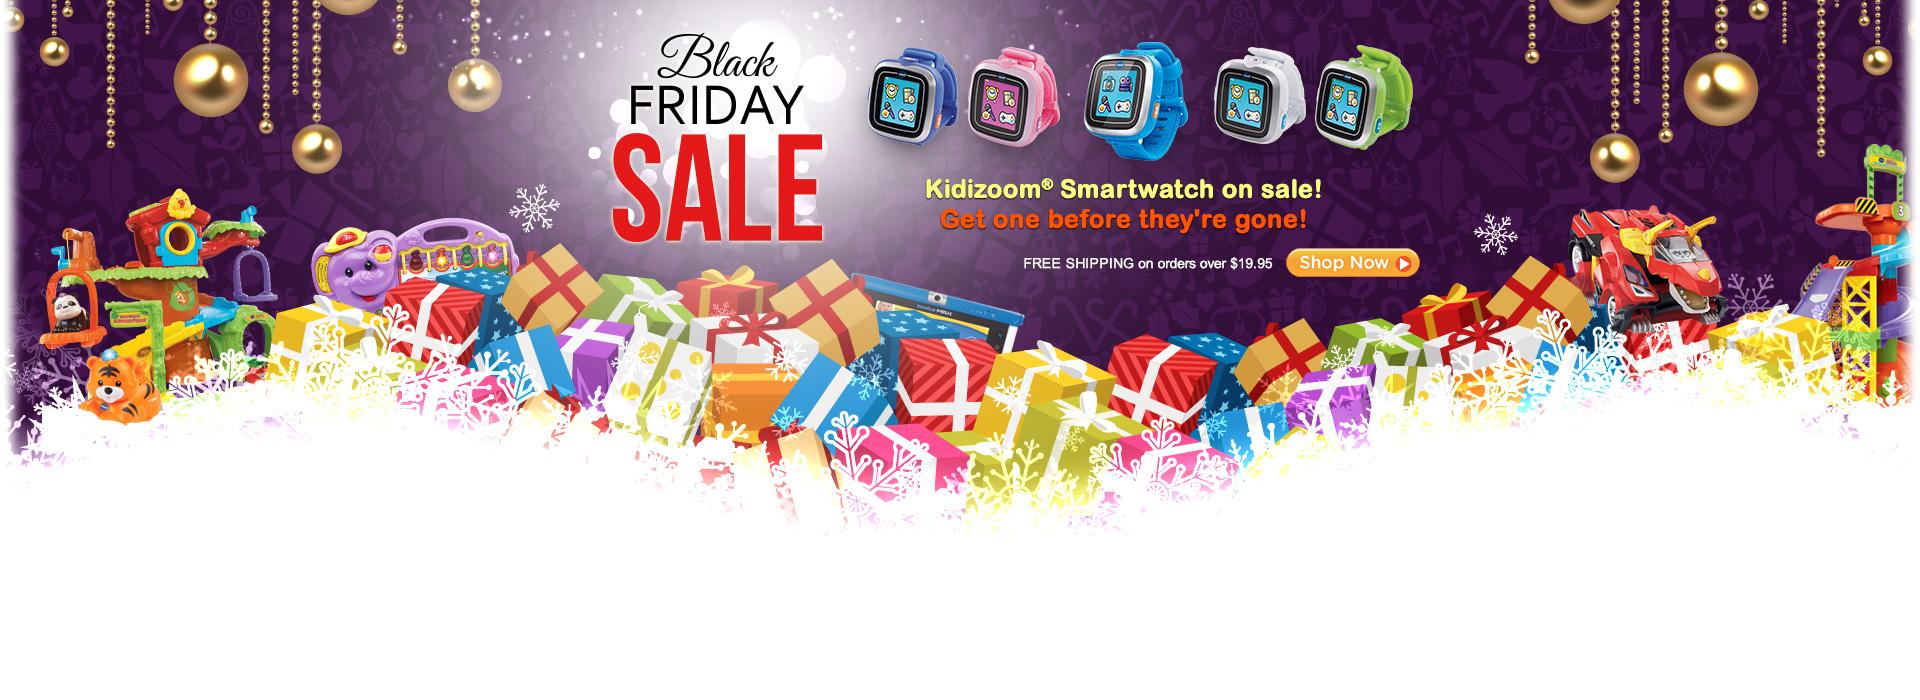 Black Friday Sale - Kidizoom Smartwatch on sale